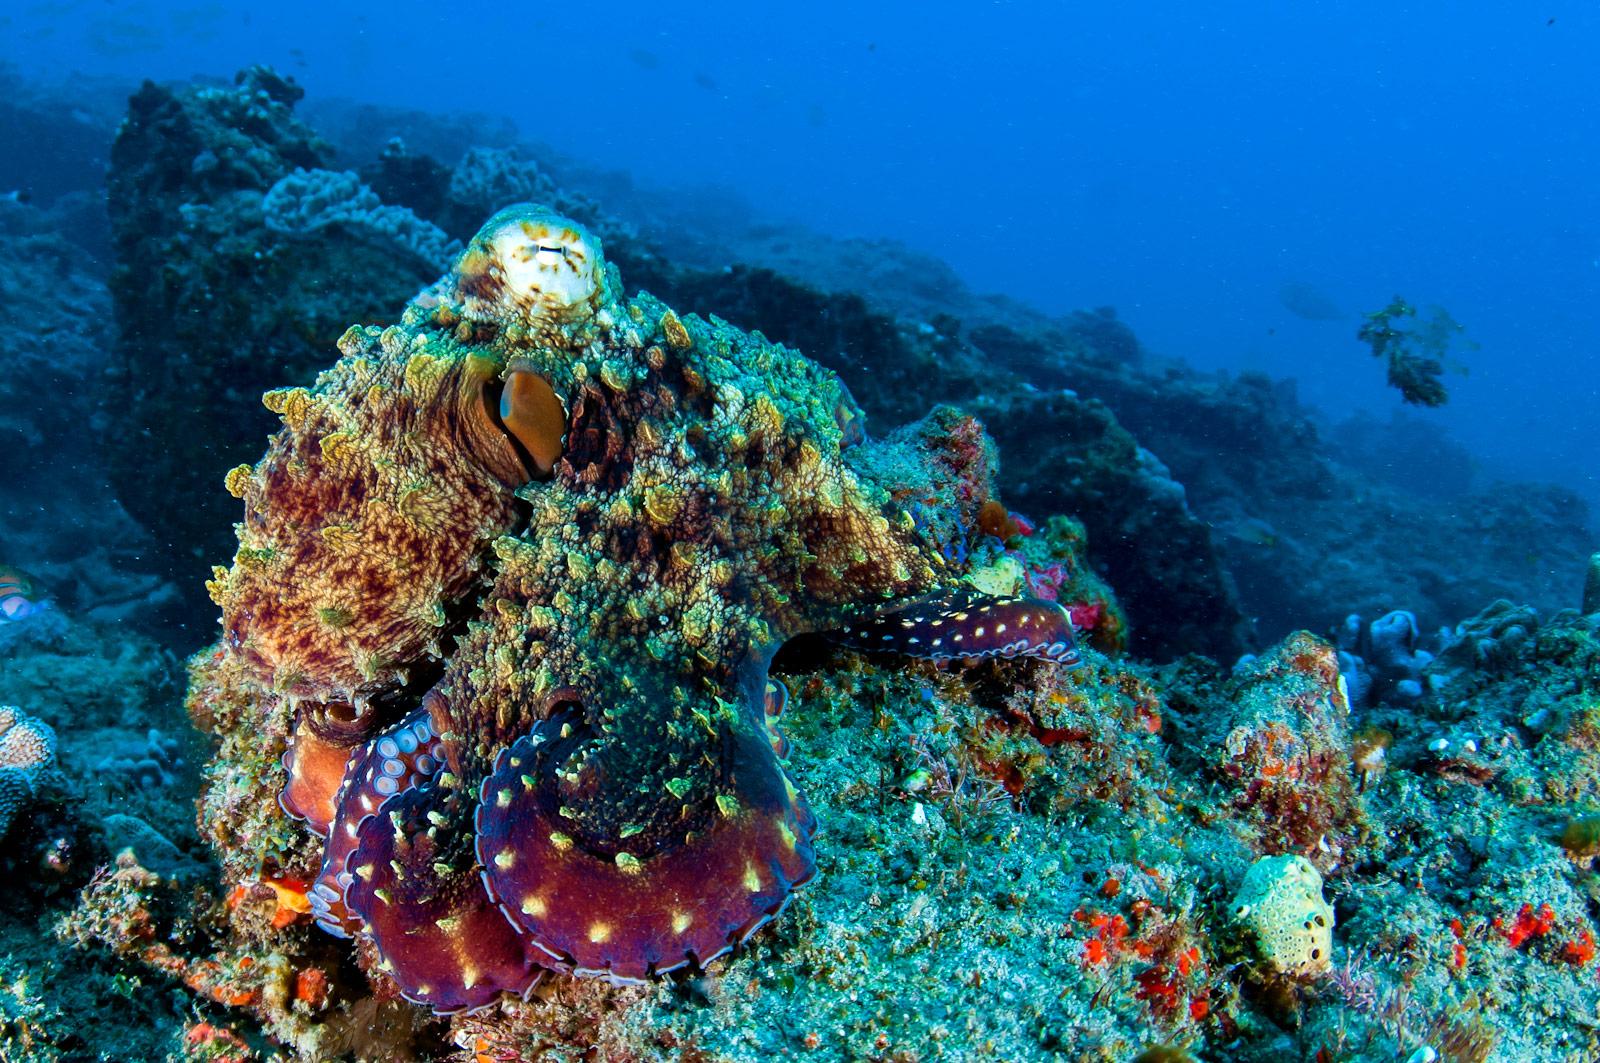 Octopus-east-african-coral-reefs-diving-DSC_8352-copy-2